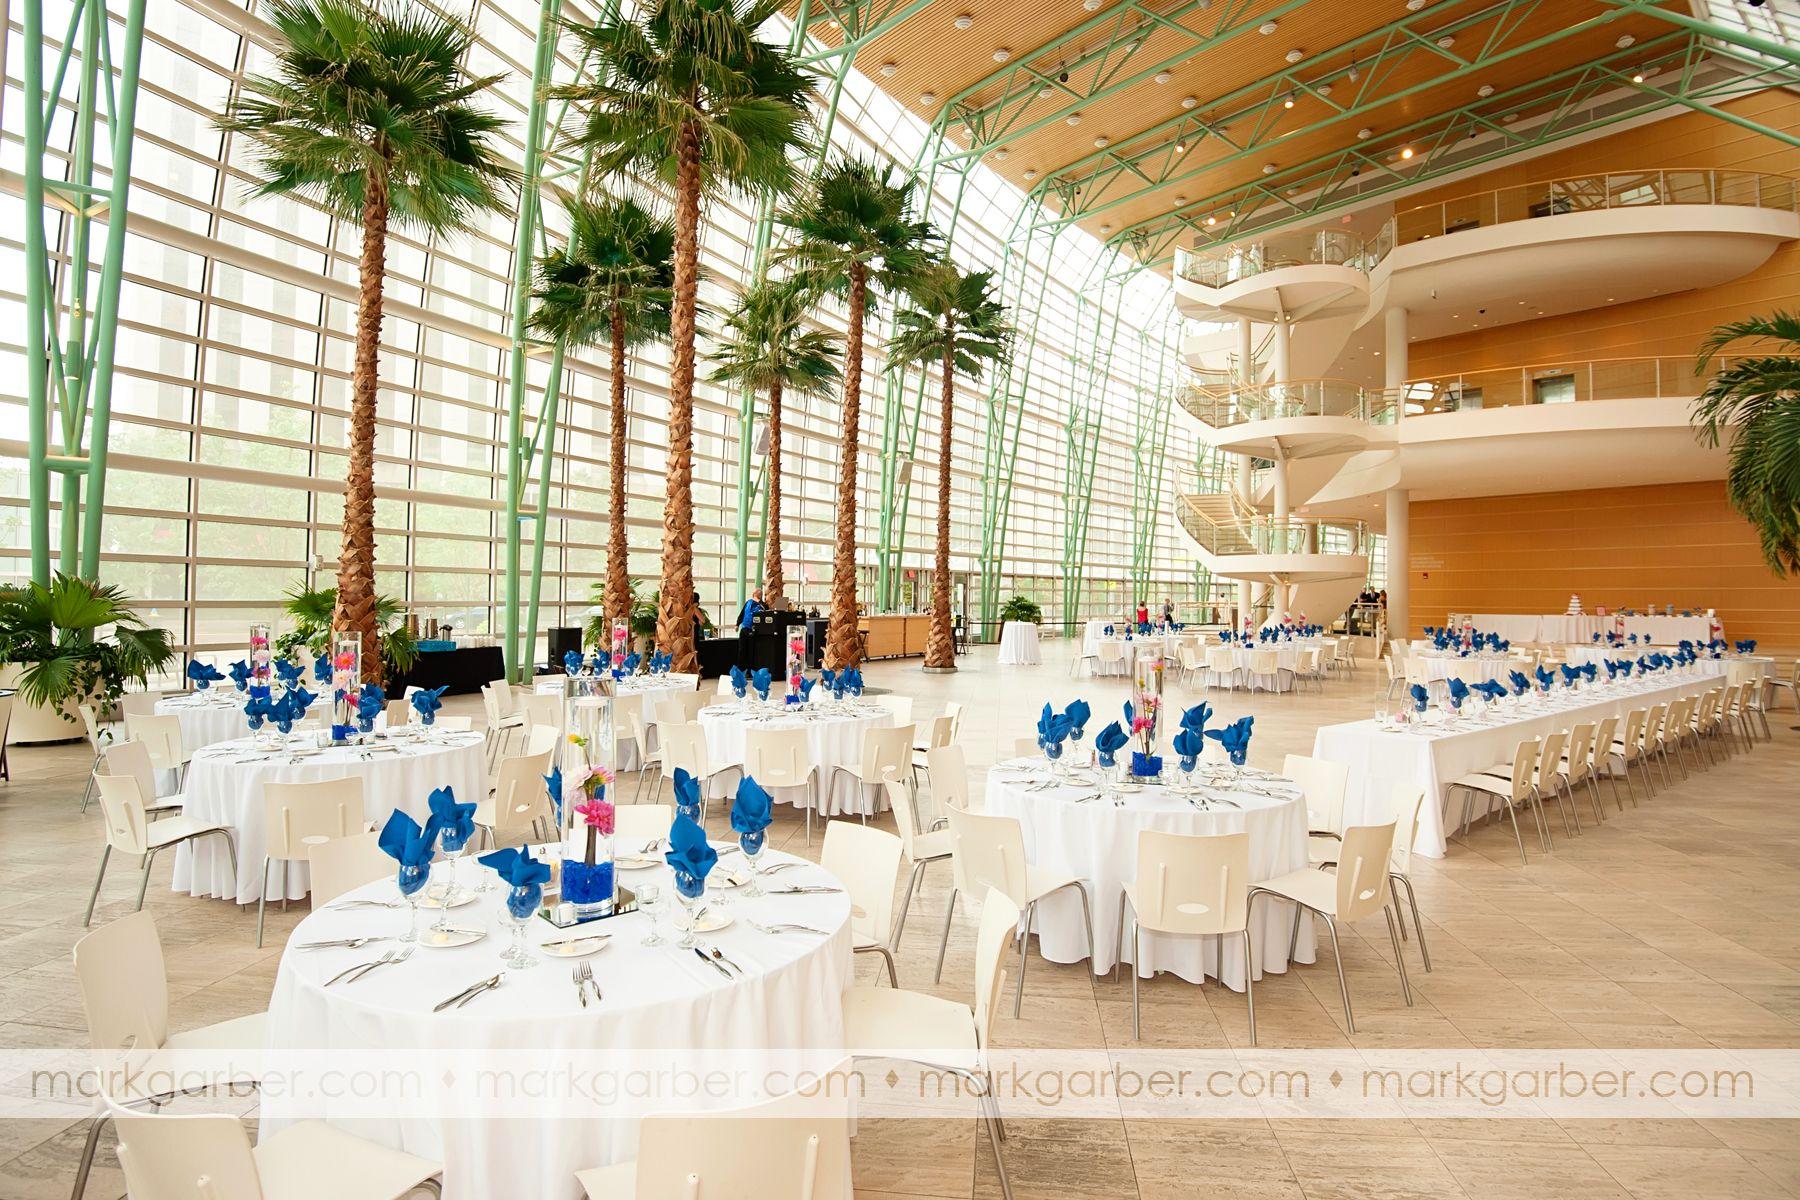 Schuster Center Dayton Pink Royalblue Weddings Events Primetimepr Markgarberphotography Event Rental Wedding Rentals Party Rentals